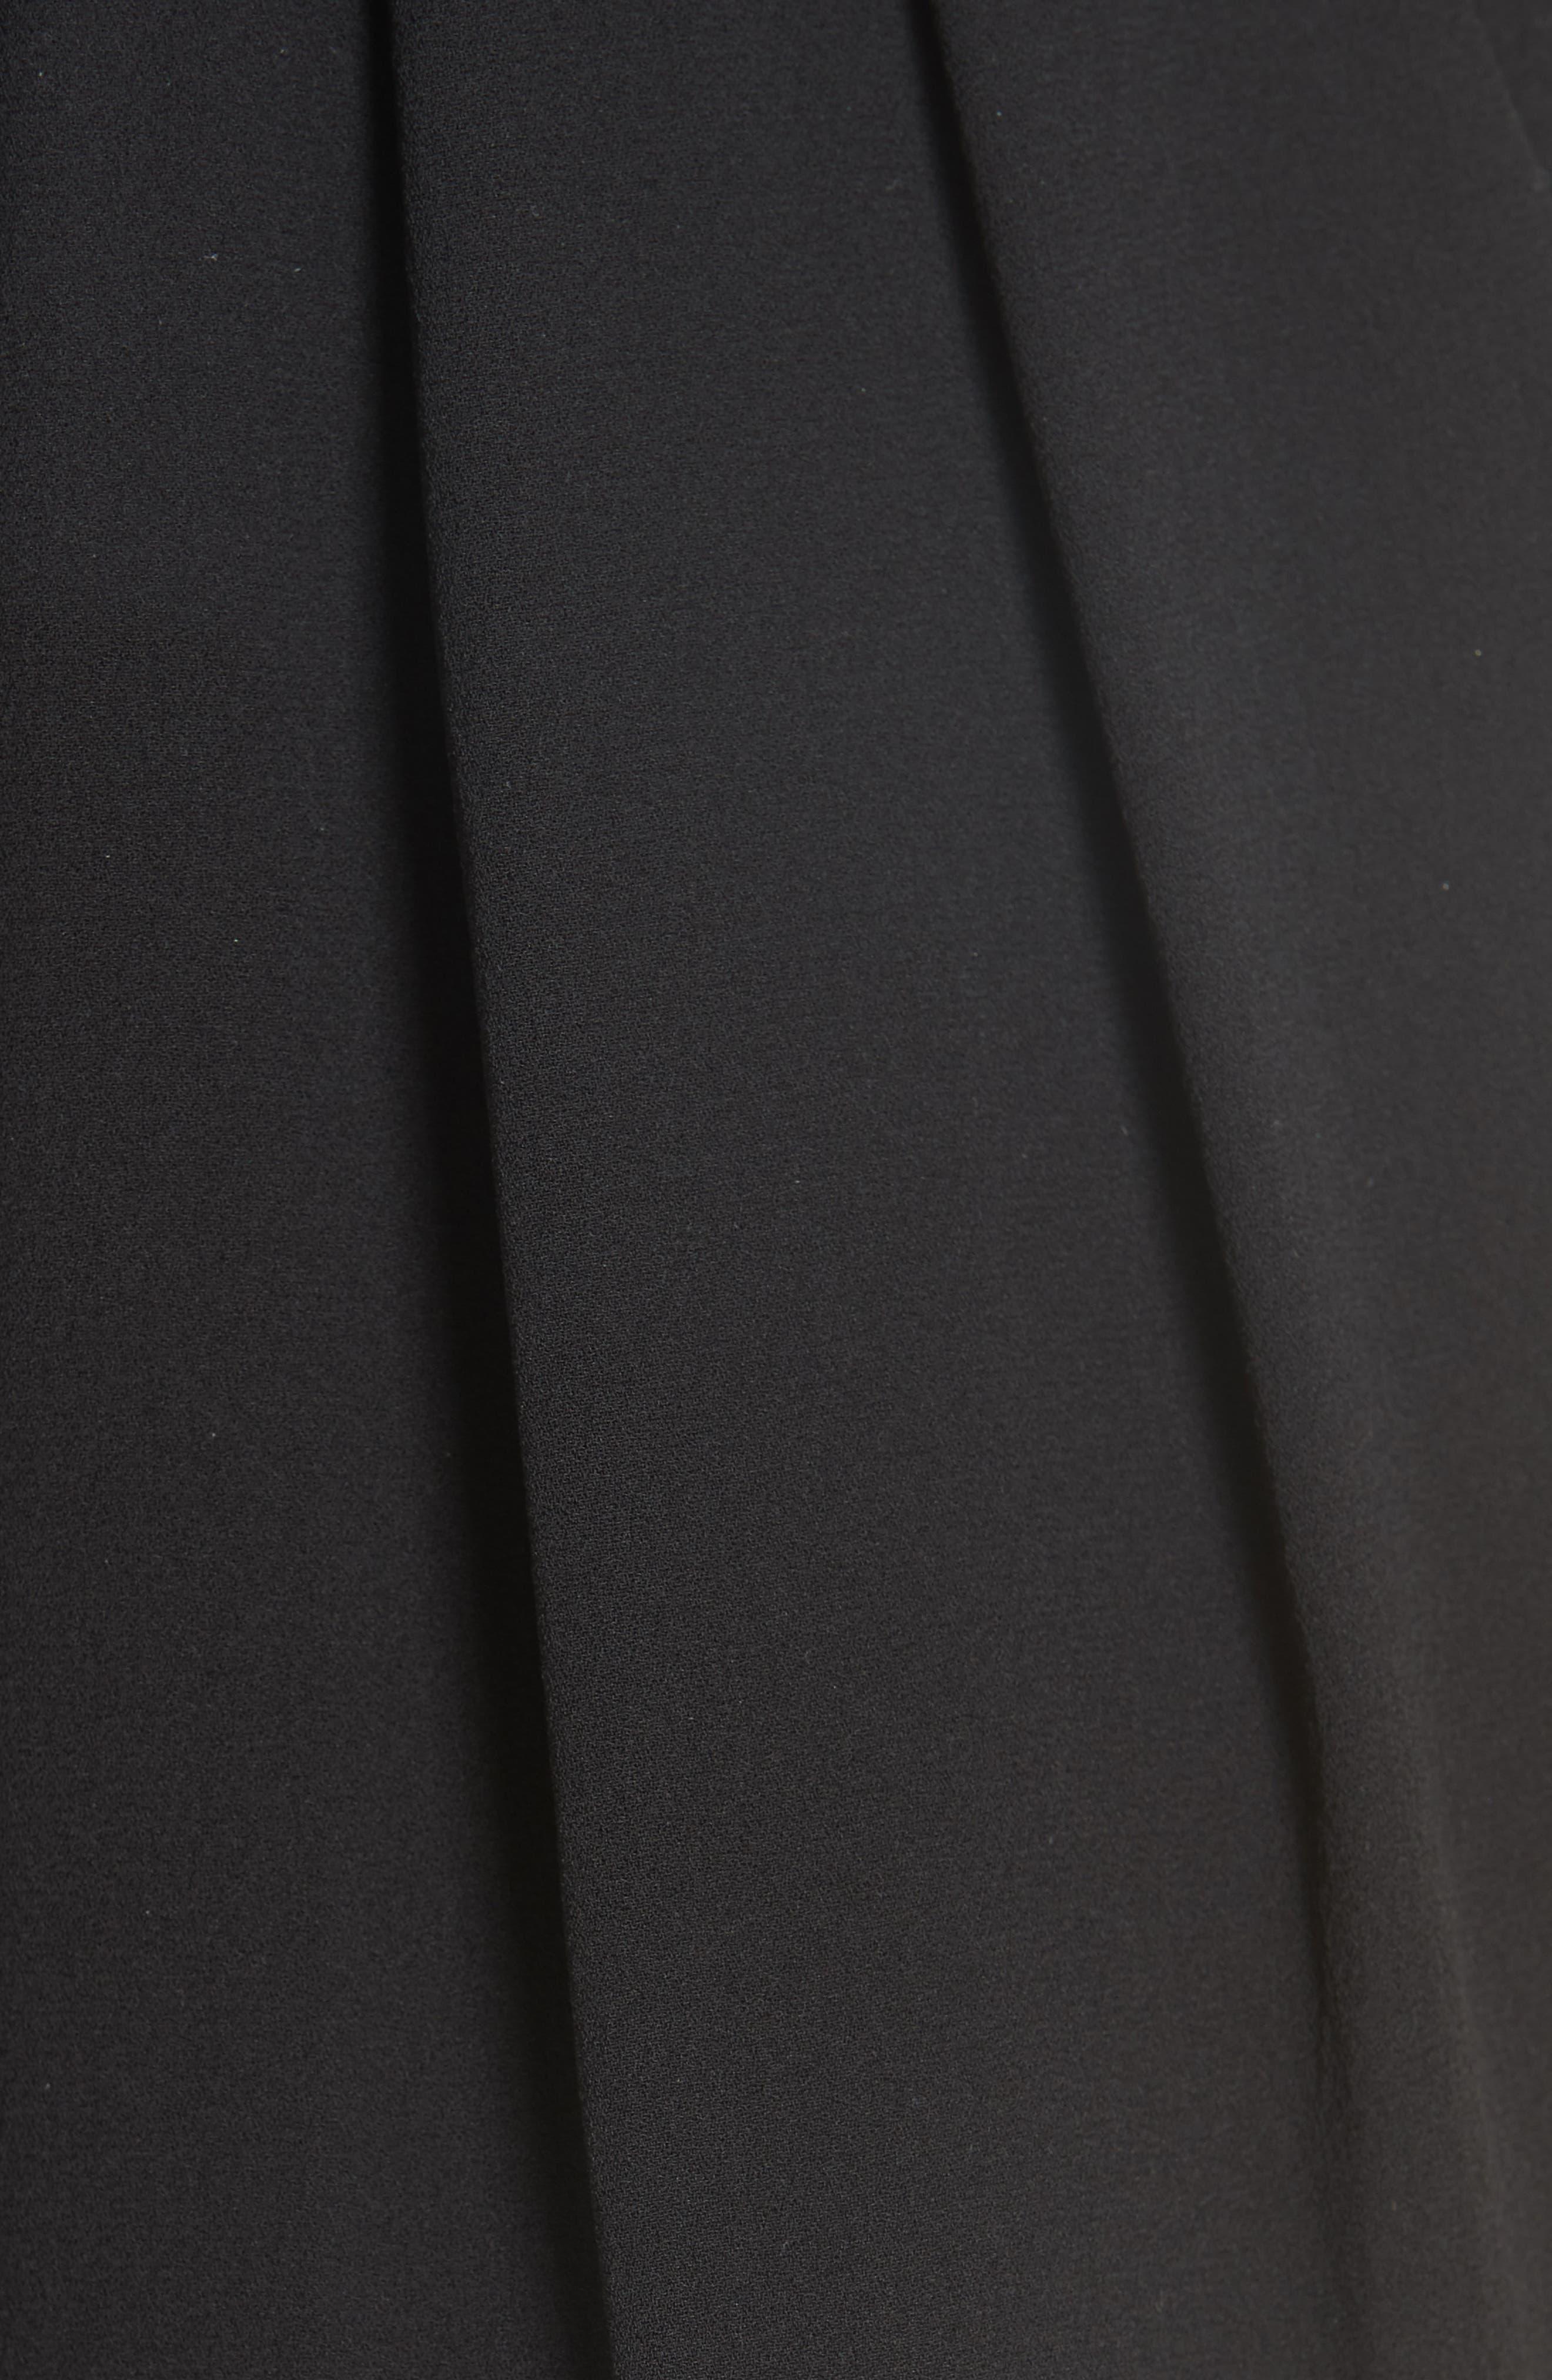 MICHAEL KORS,                             Silk Georgette Joggers,                             Alternate thumbnail 5, color,                             BLACK